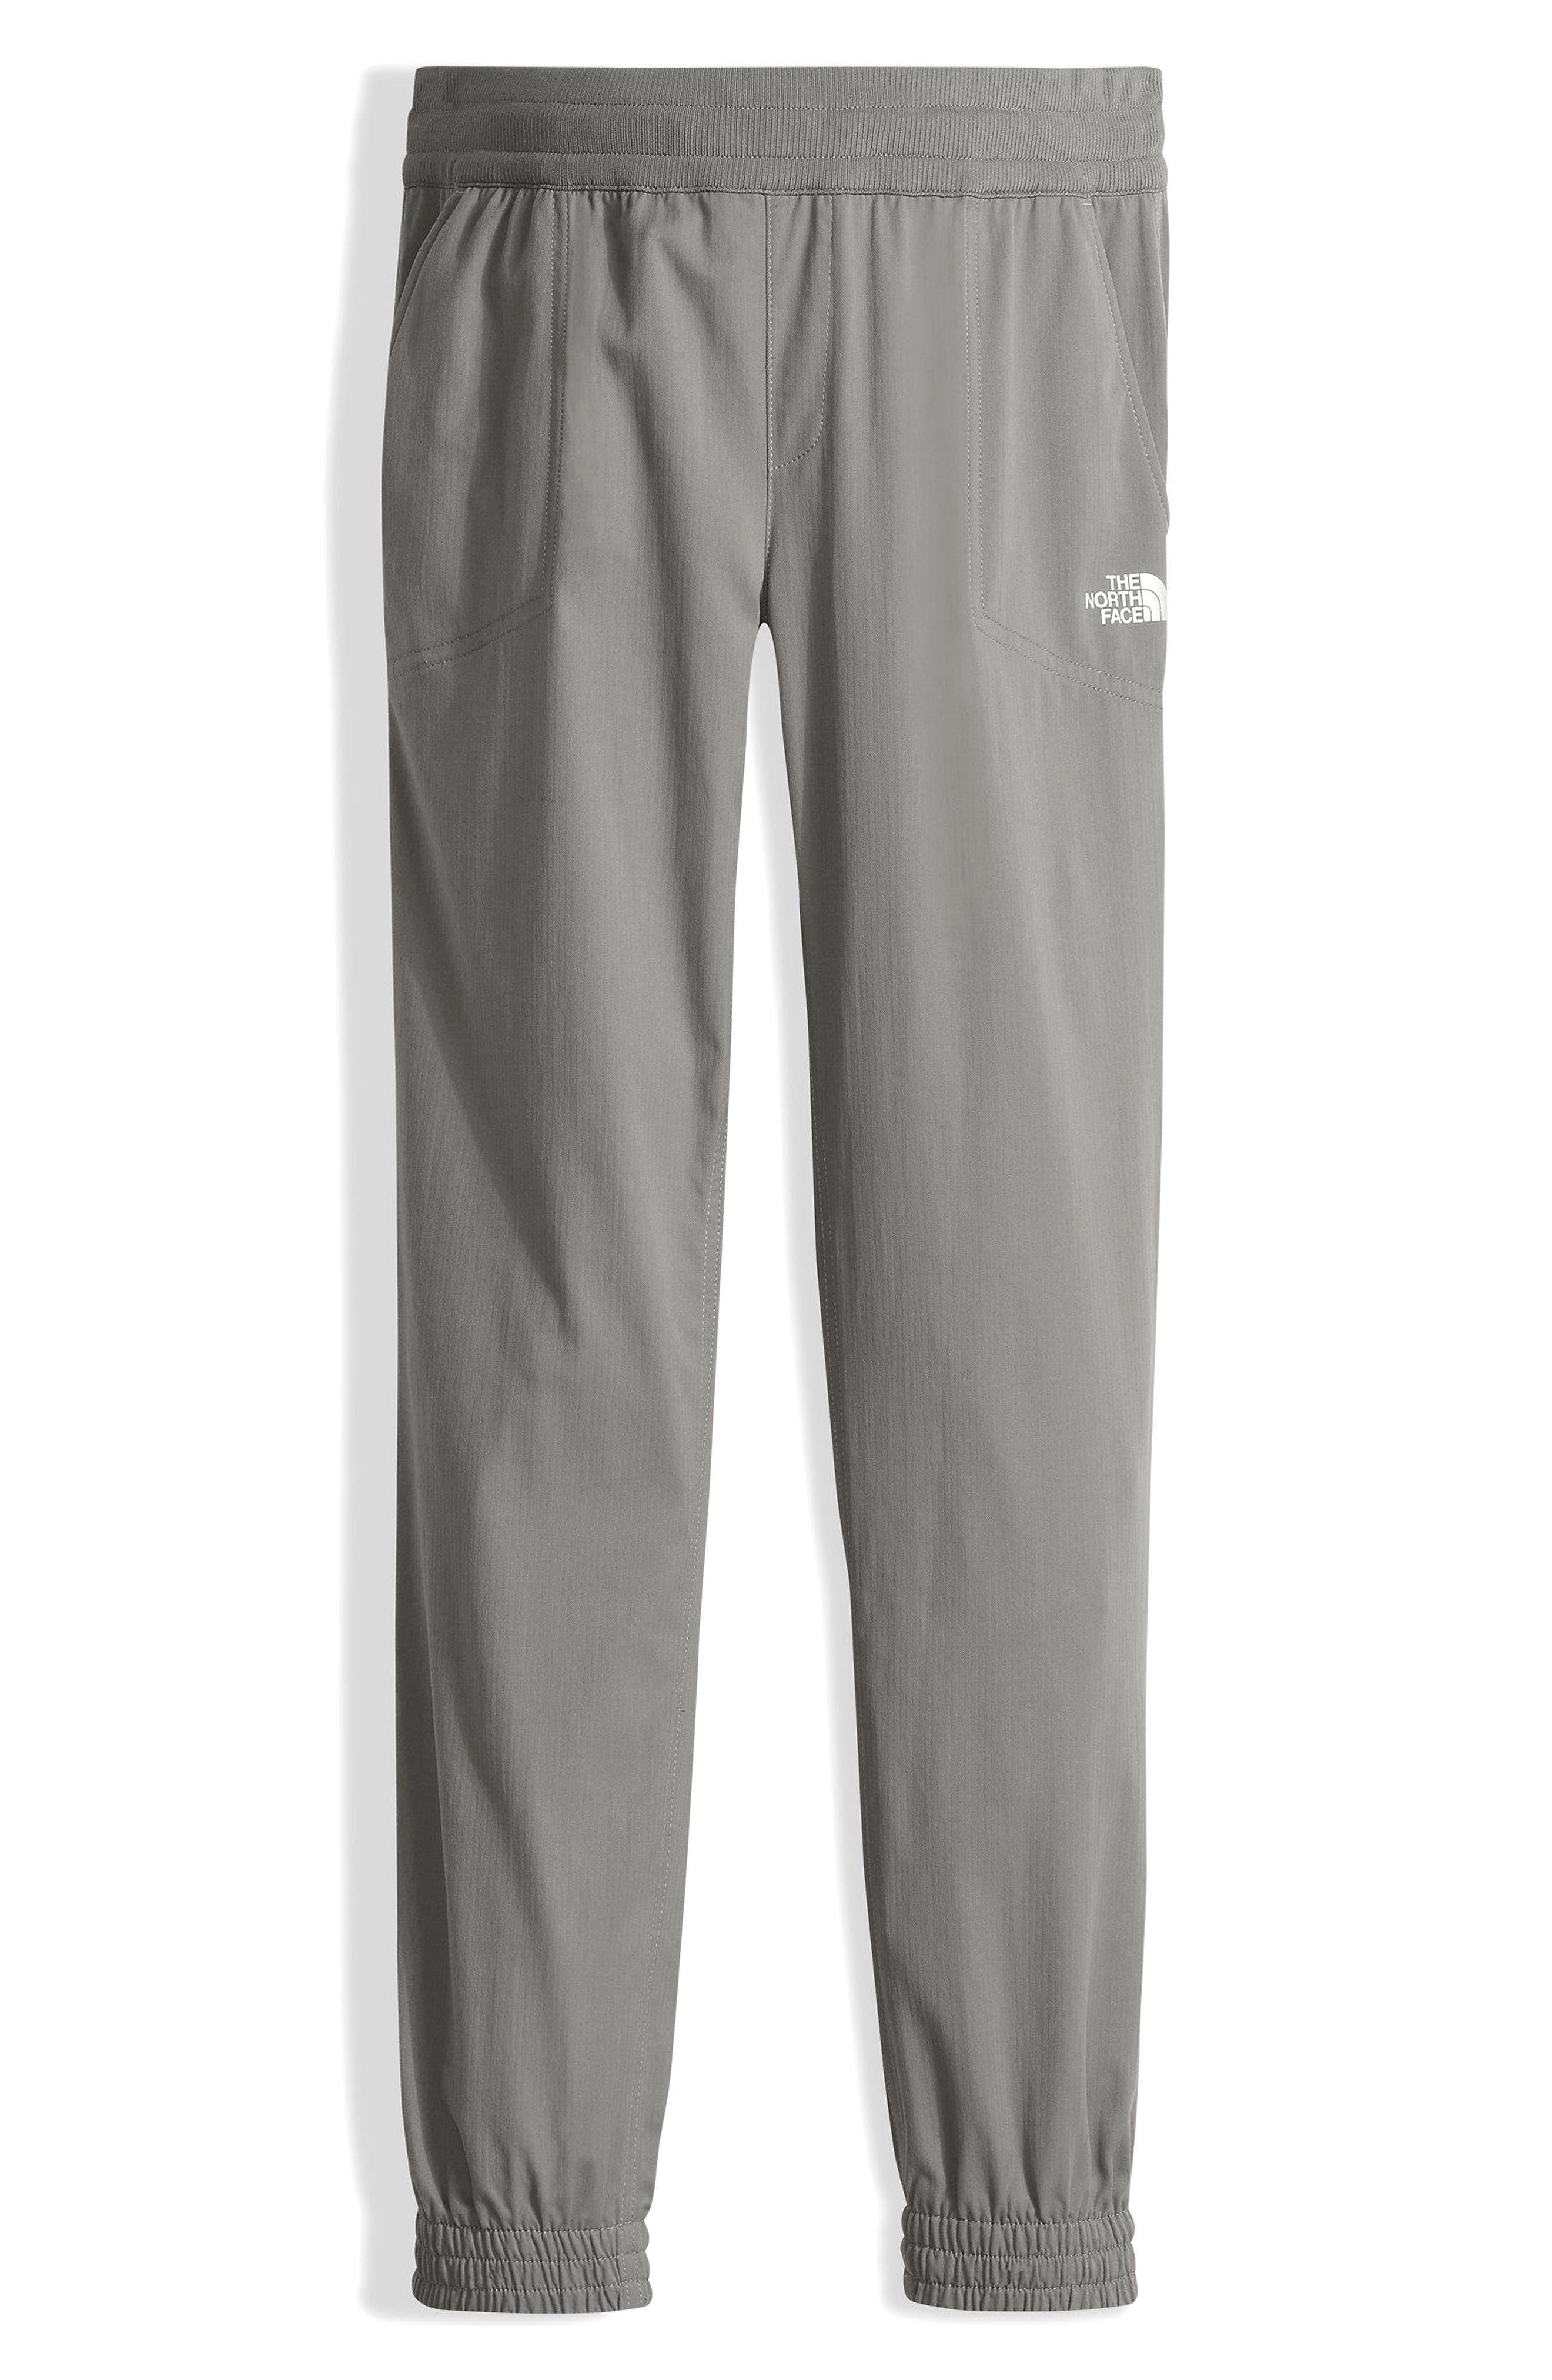 Aphrodite Pants,                         Main,                         color, Grey